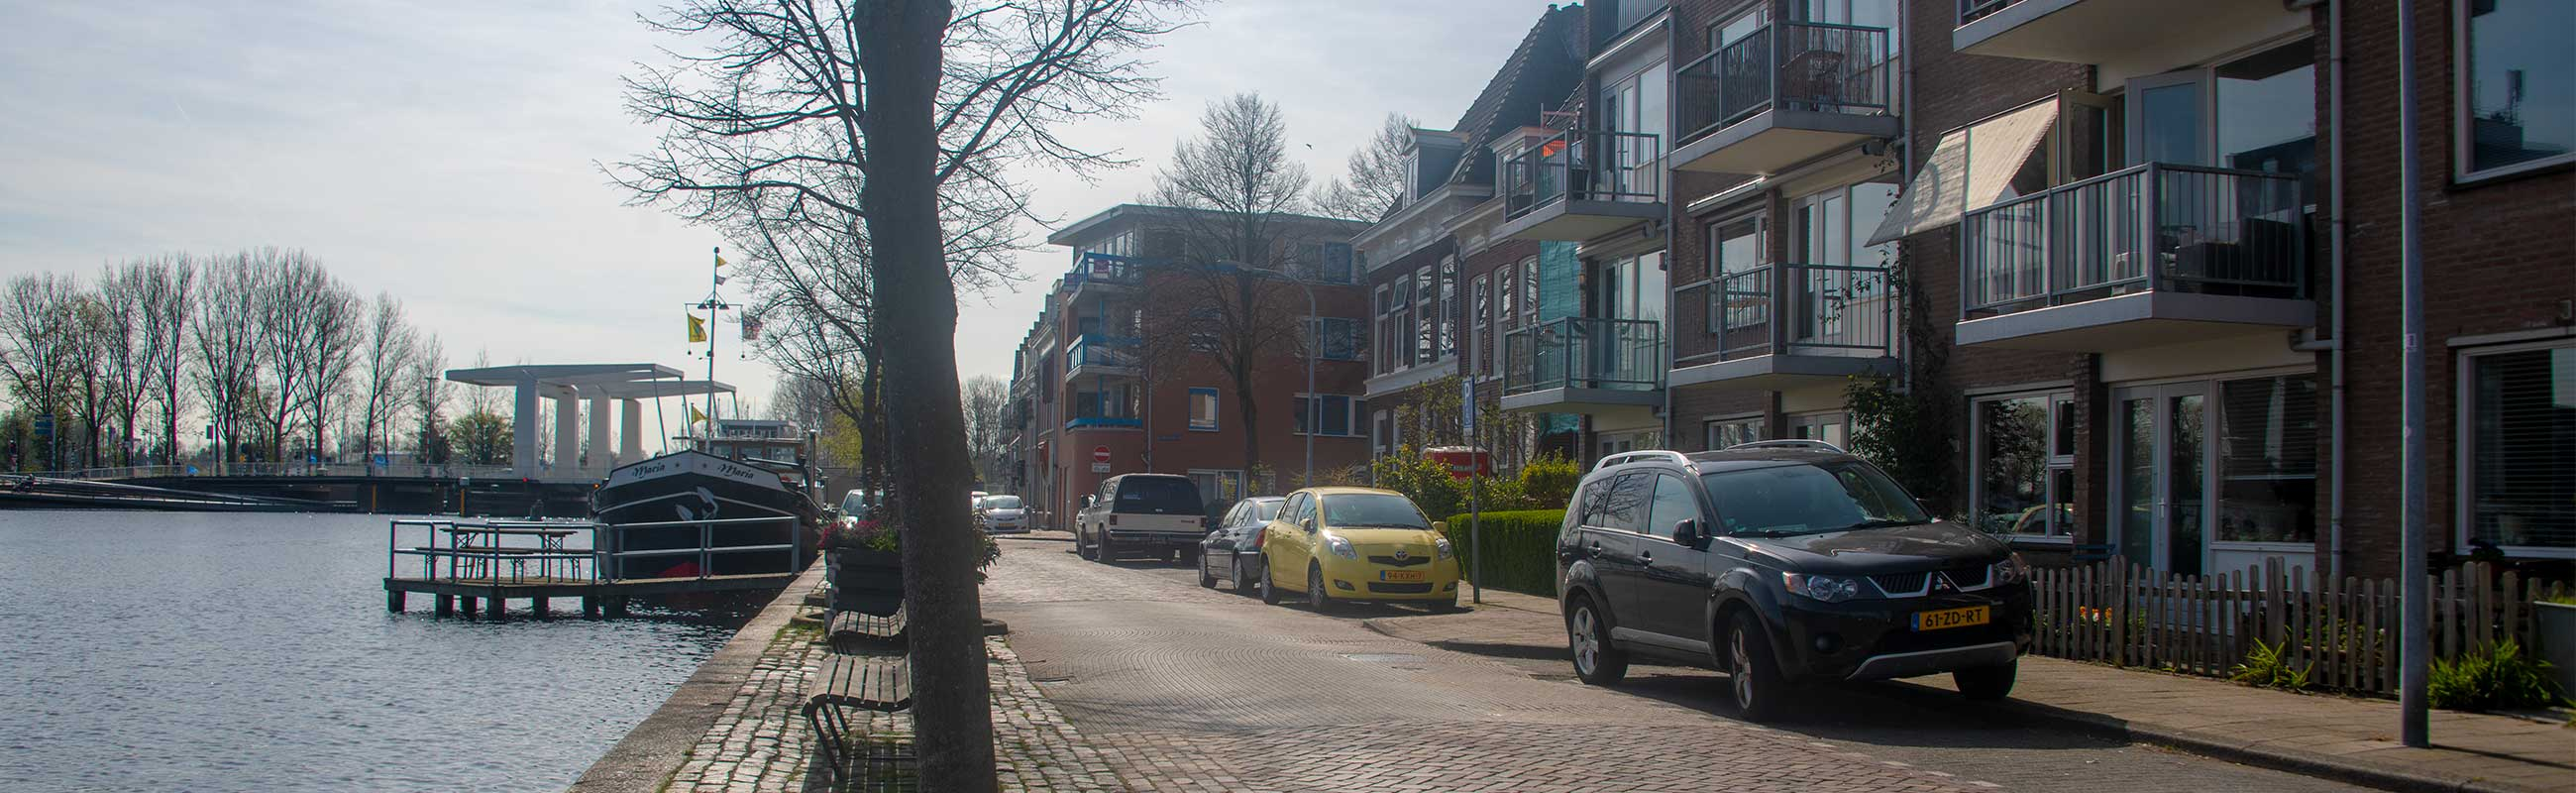 Het Rozenprieel in Haarlem Zuid in het Haarlemmerhoutkwartier